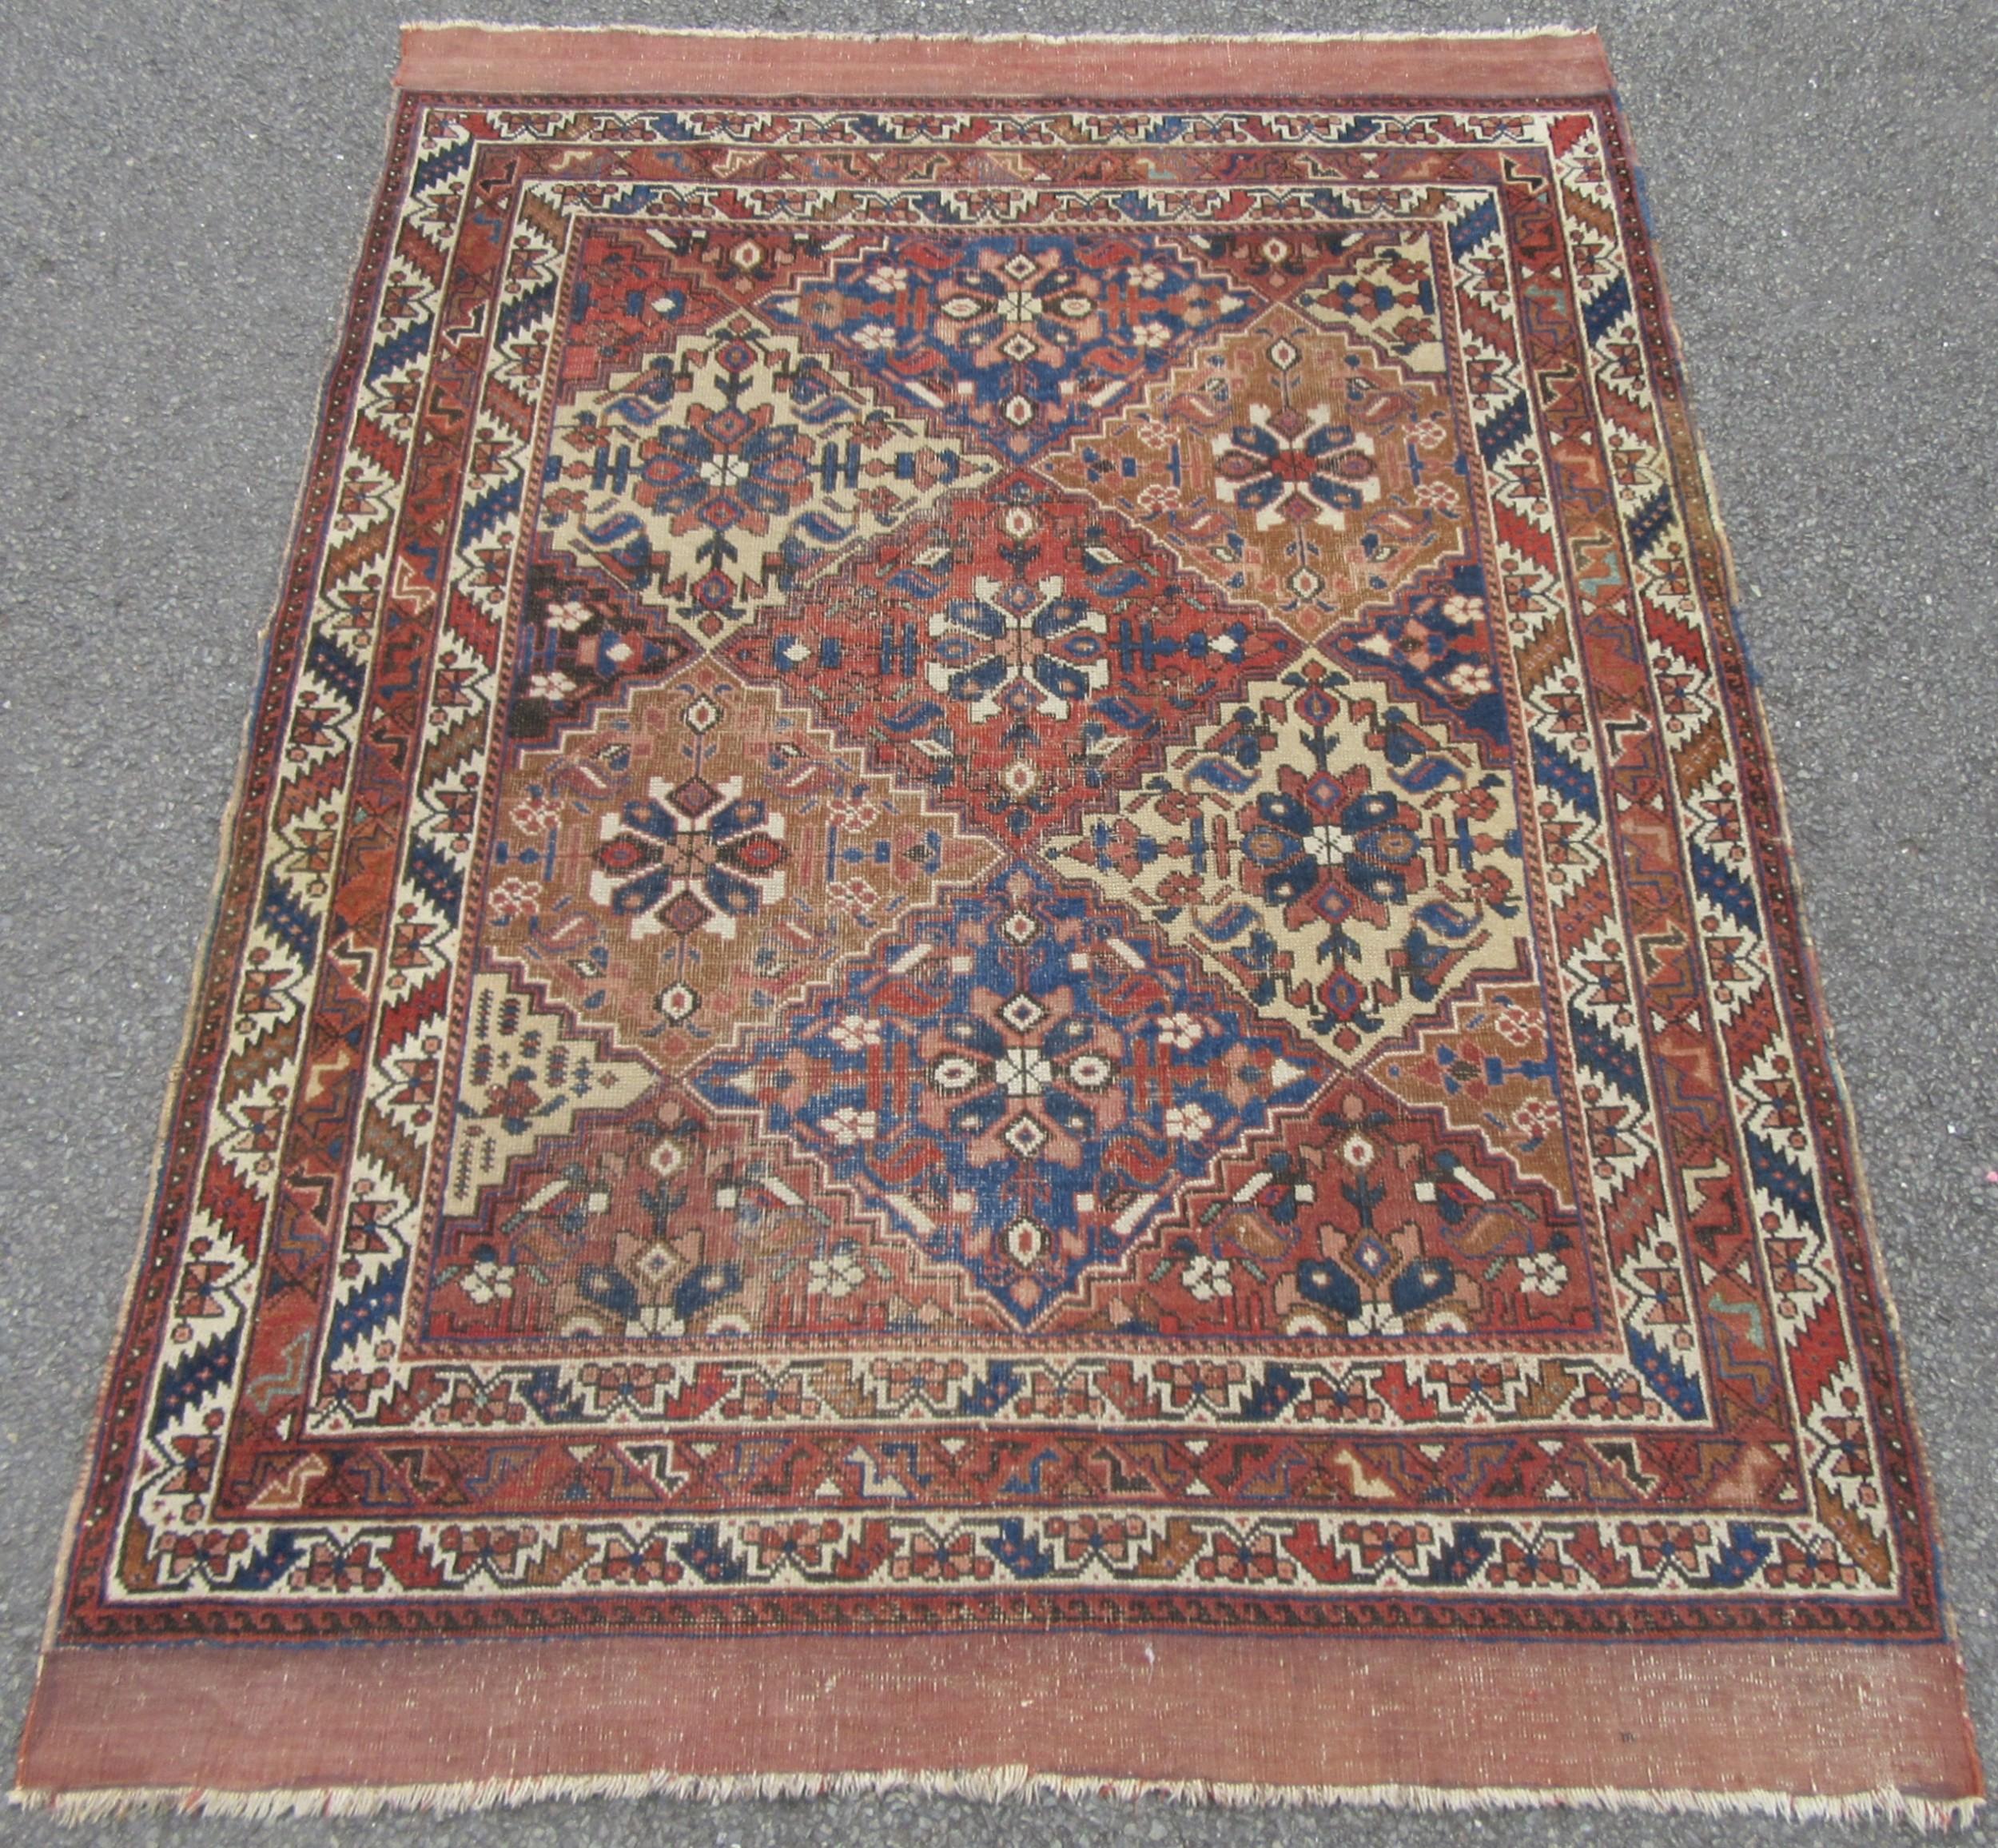 rare pattern antique persian khamseh tribal rug 2nd half 19th century